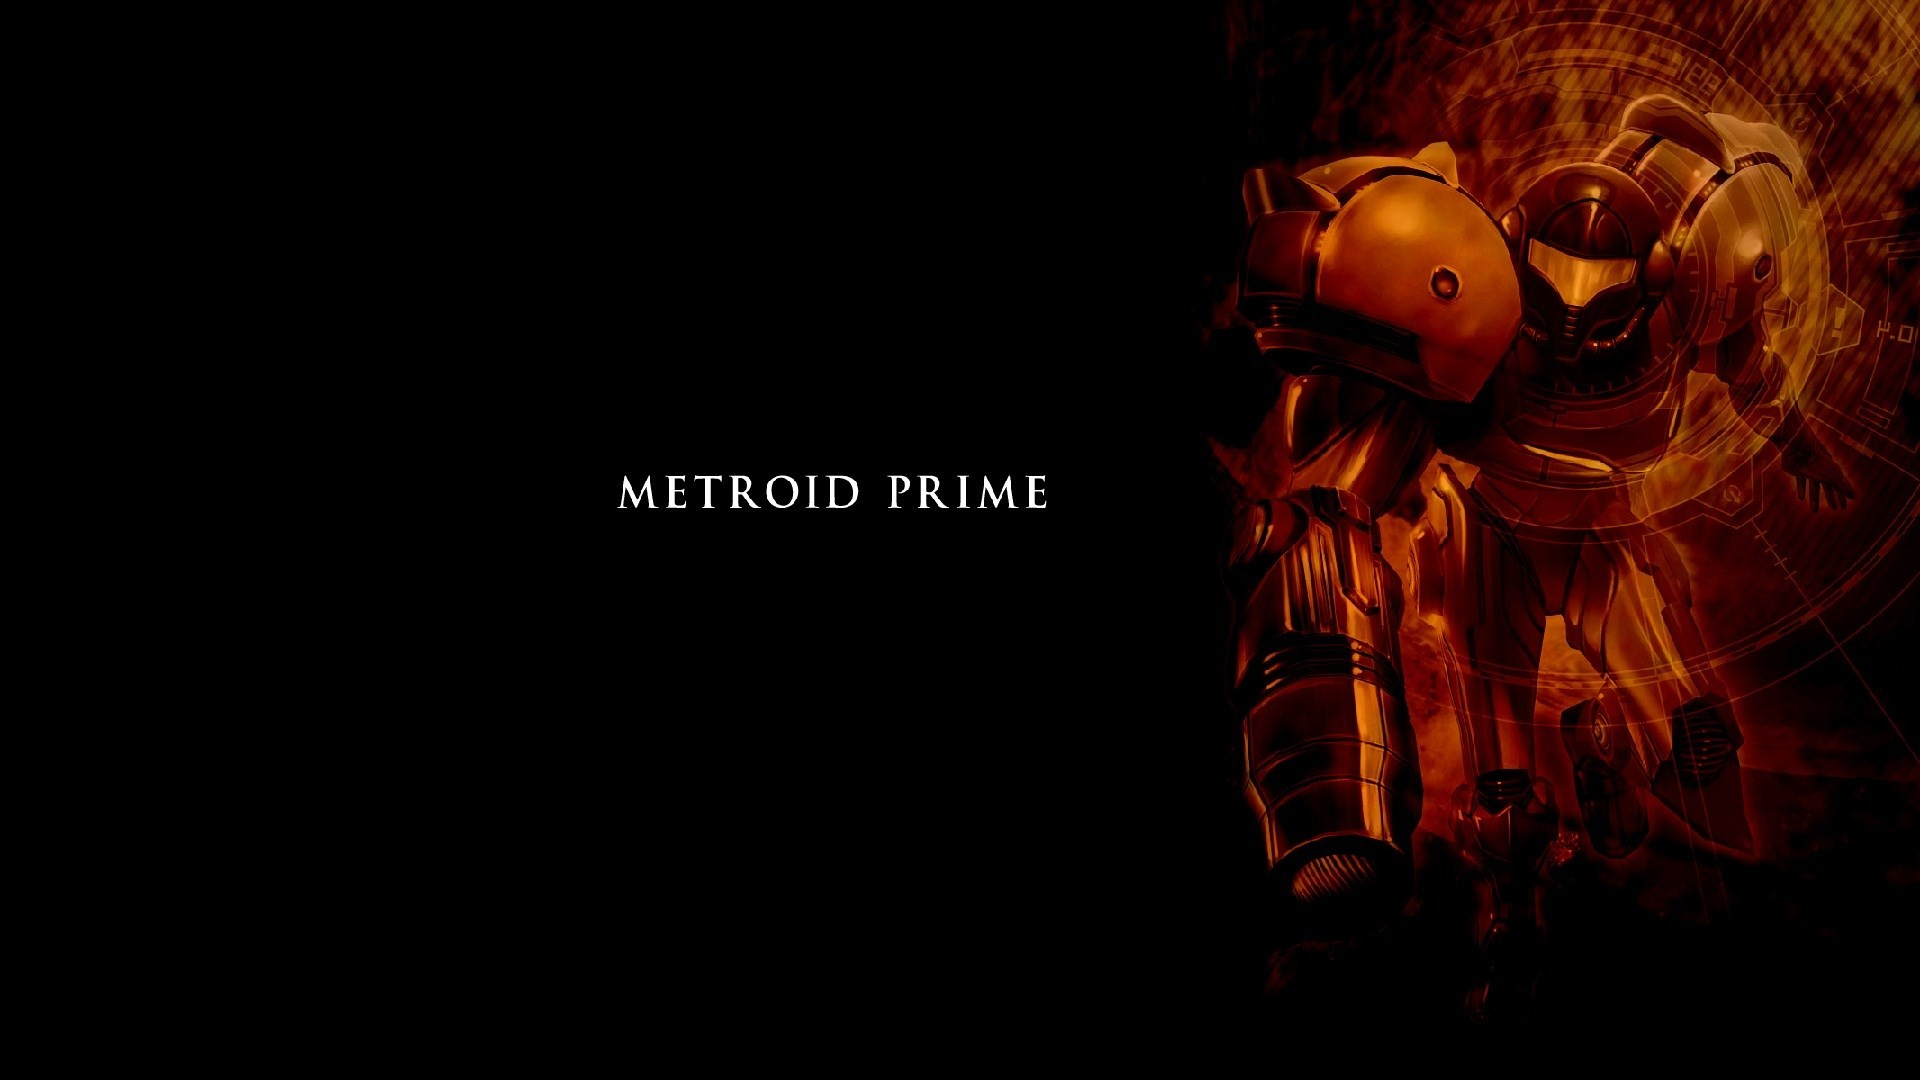 metroid prime – Full HD Wallpaper, Photo   hueputalo   Pinterest    Metroid prime